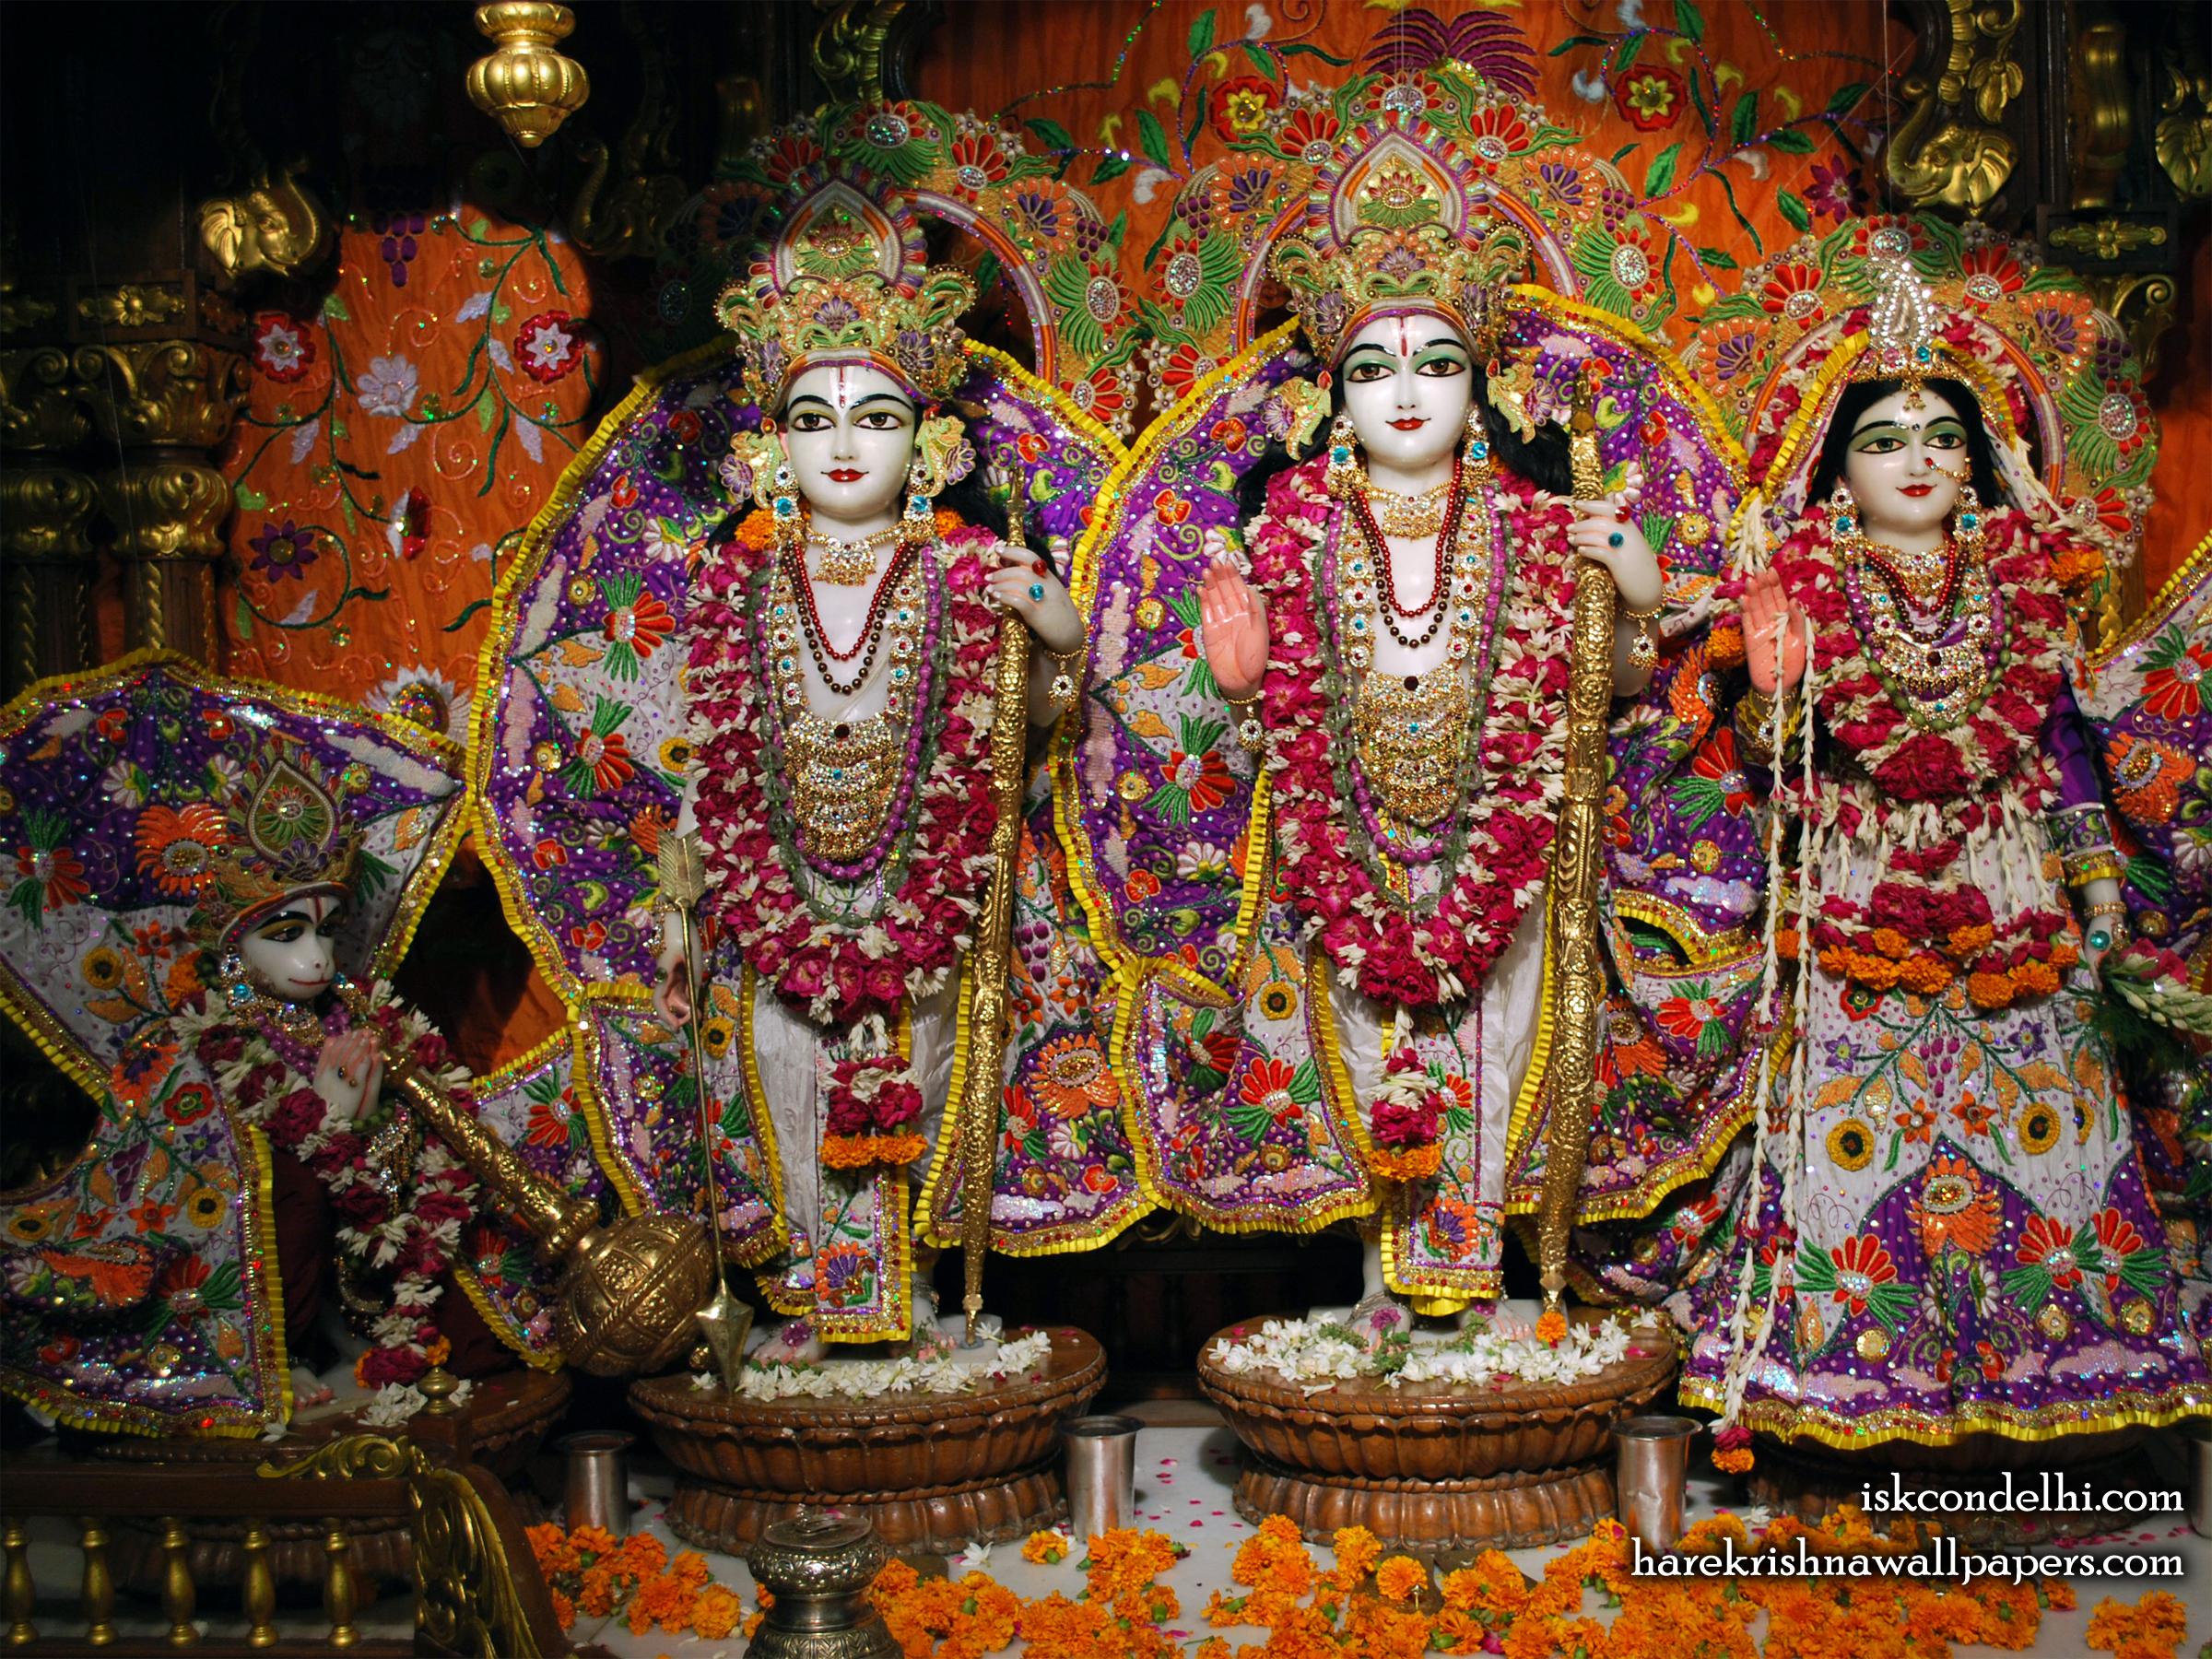 Sri Sri Sita Rama Laxman Hanuman Wallpaper (013) Size 2400x1800 Download